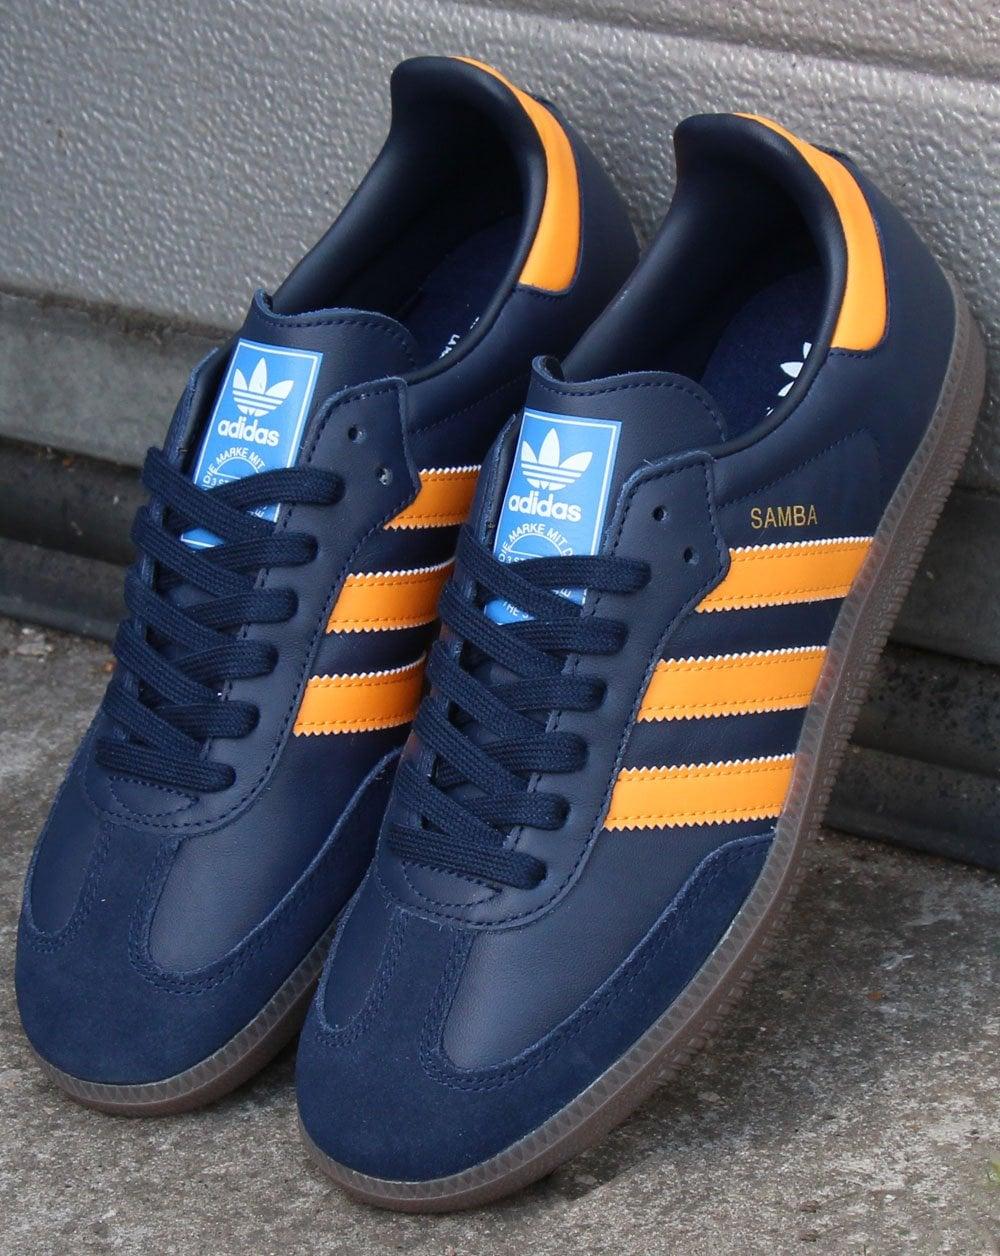 half off quality design exquisite design Adidas Samba Og Trainers Navy/Orange